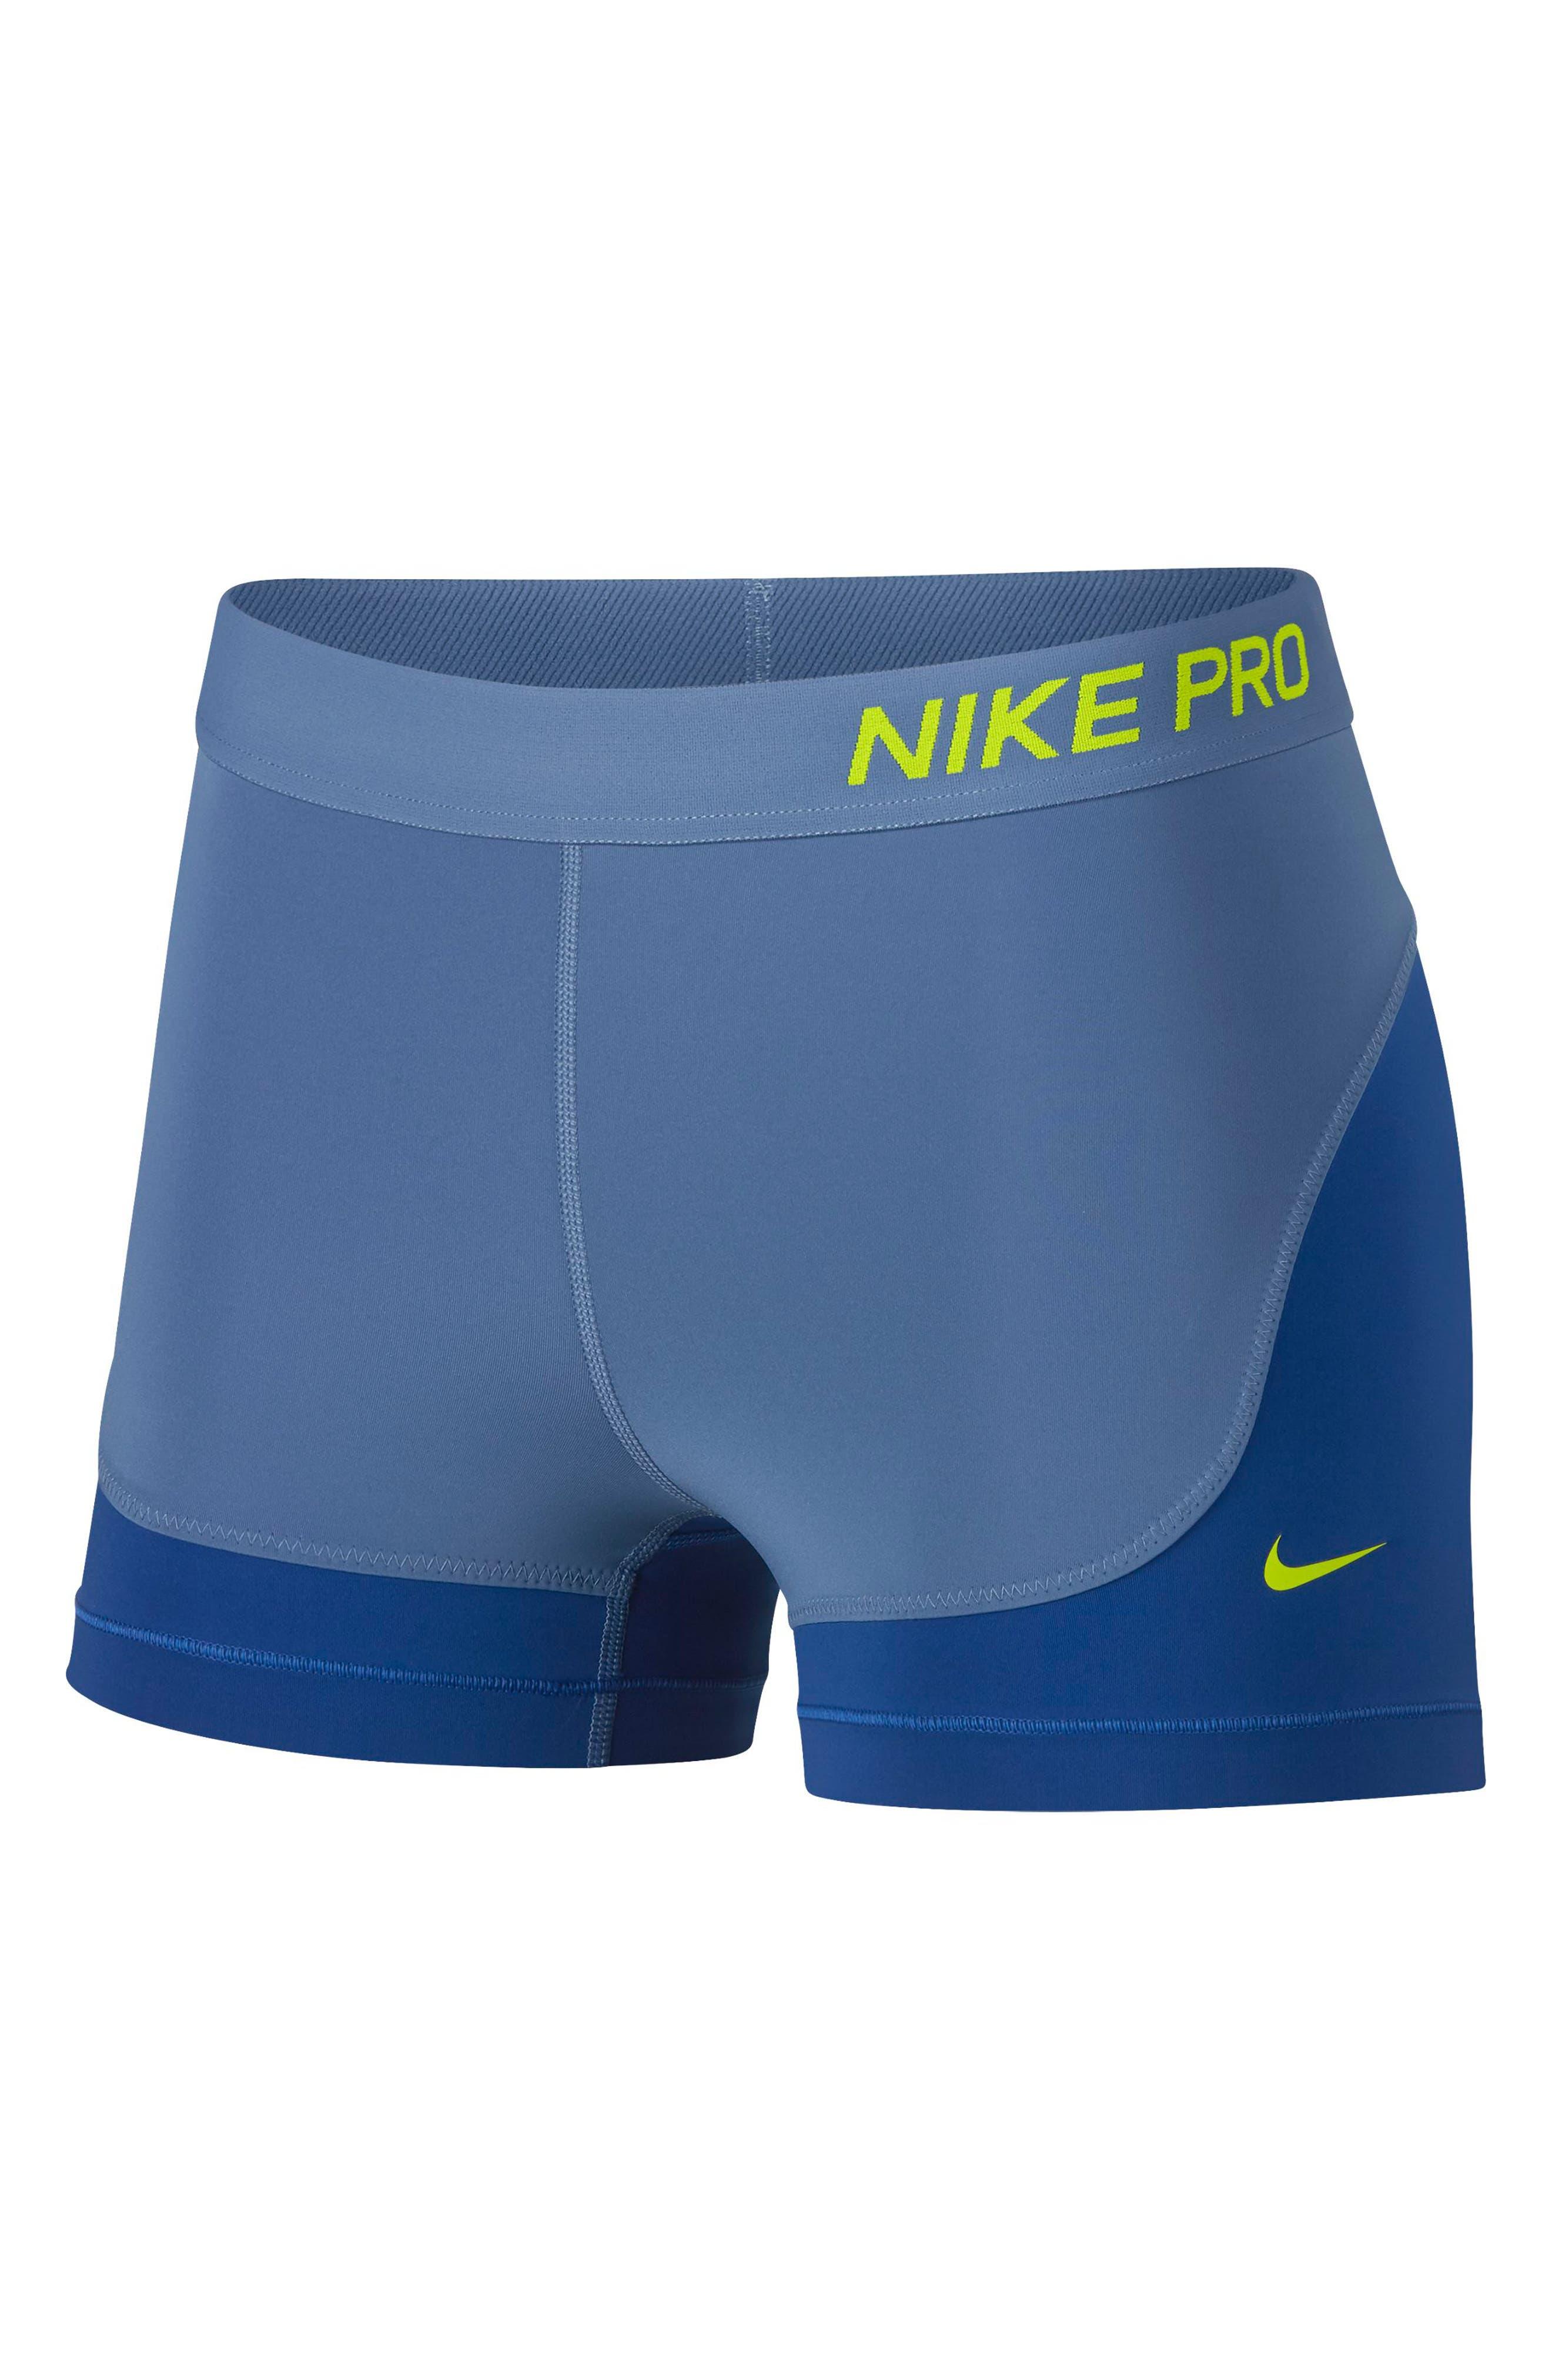 Nike Pro Compression Shorts, Blue